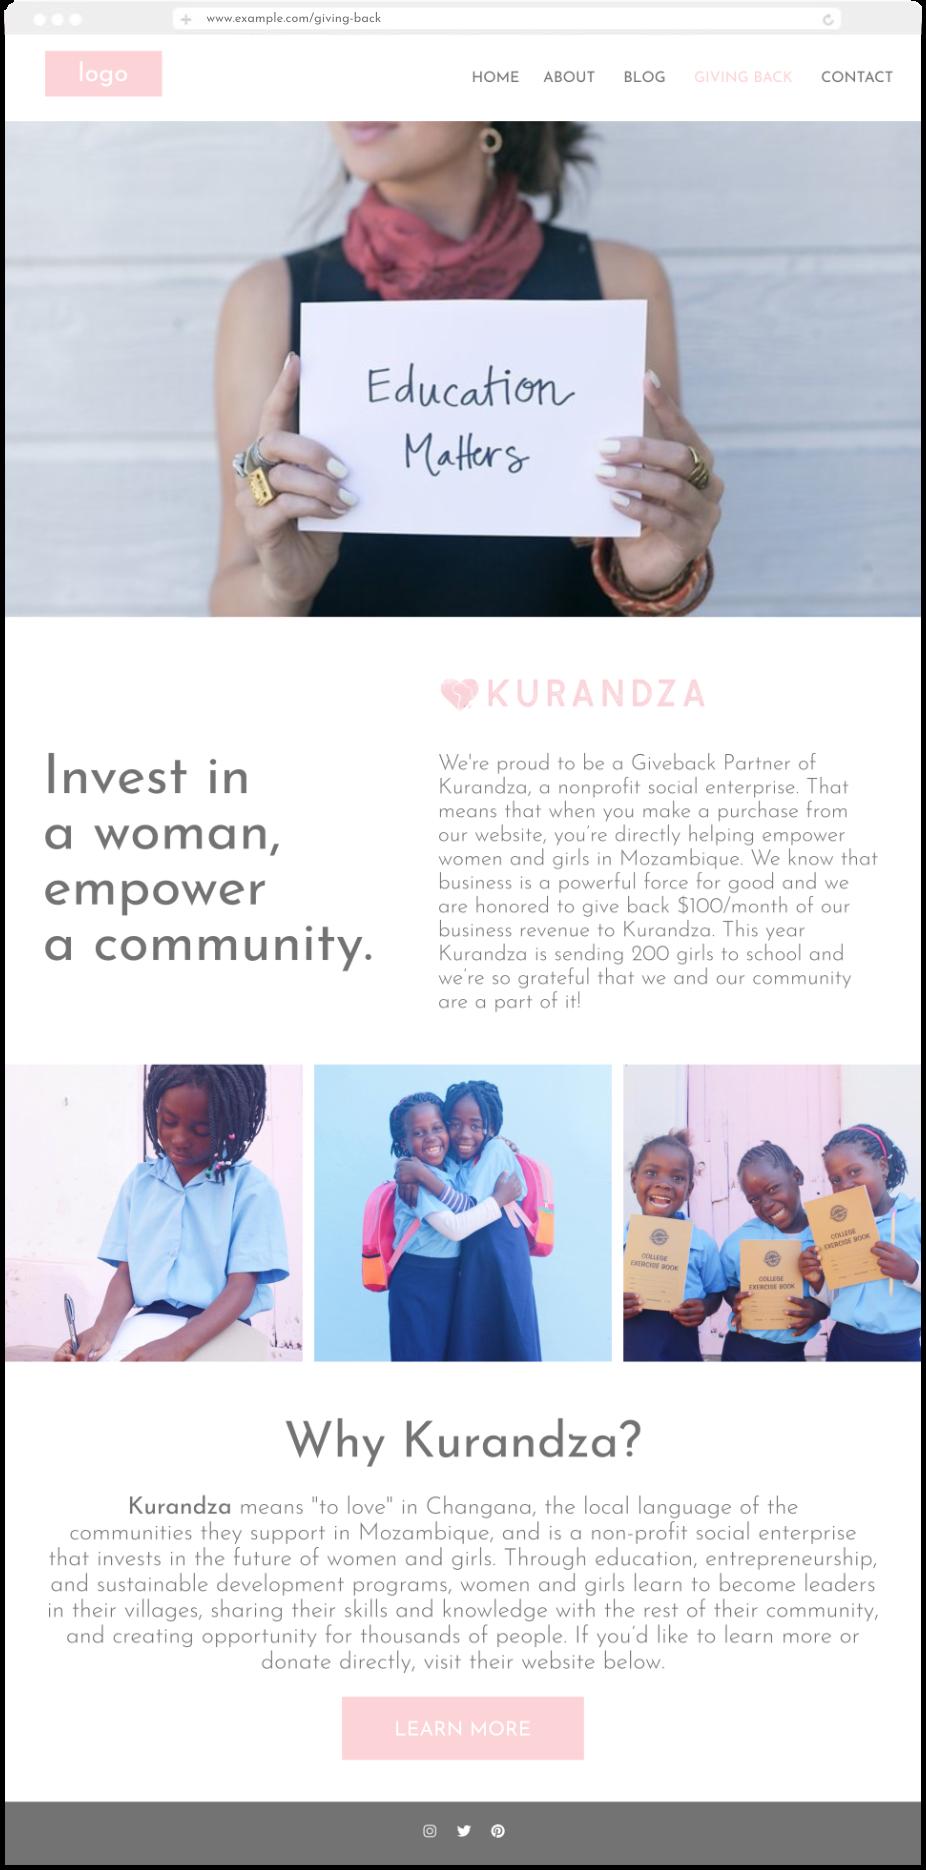 kurandza giving back page.png